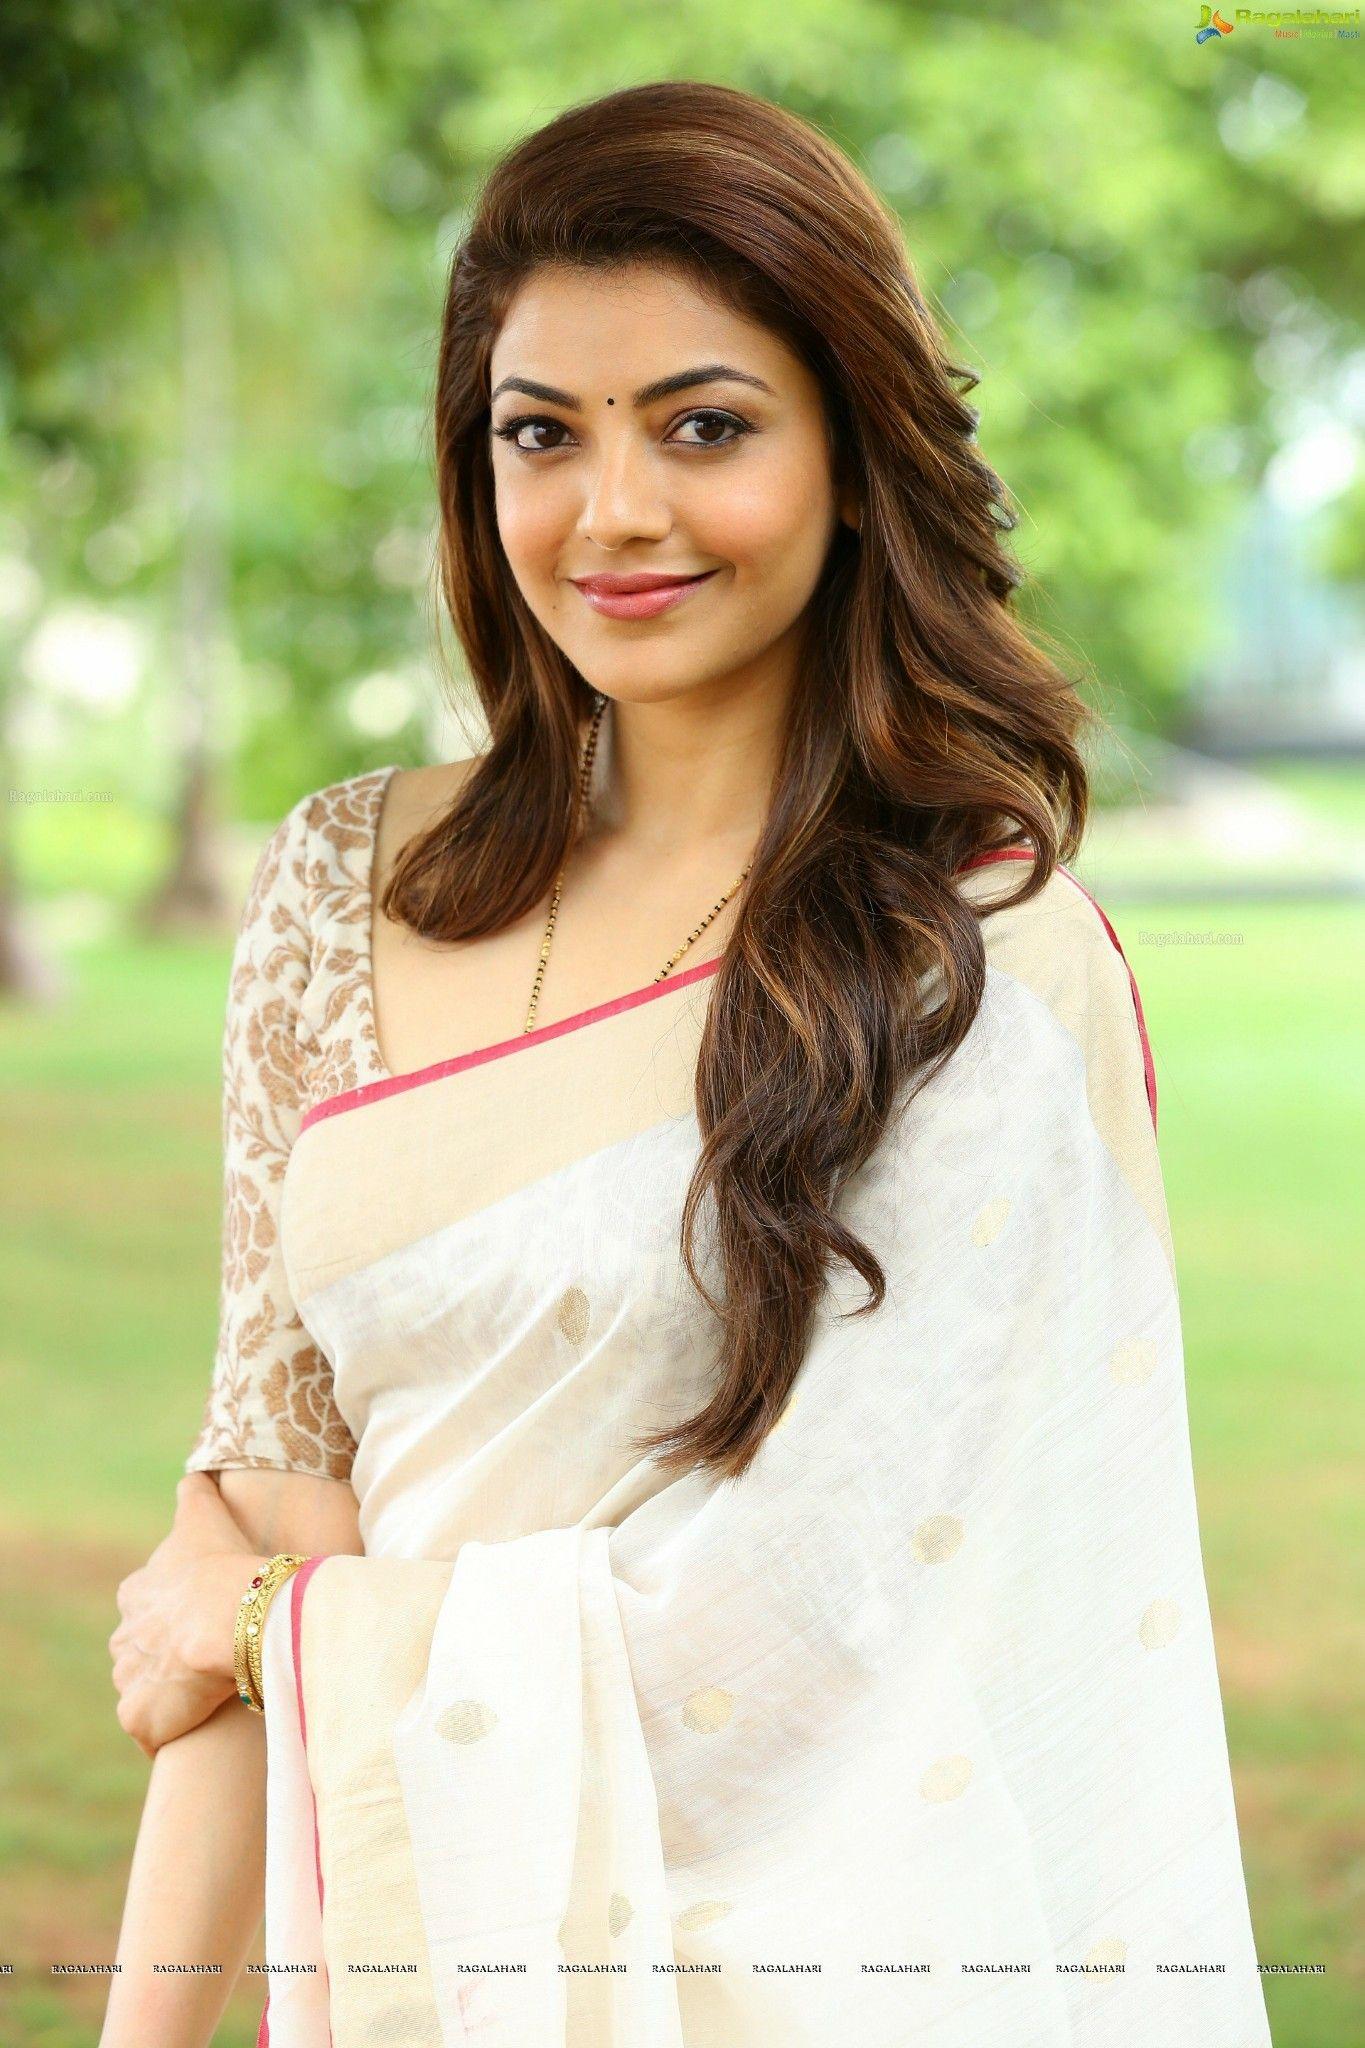 Kajal Aggarwal - Nene Raju Nene Mantri Movie Kajal , HD Wallpaper & Backgrounds